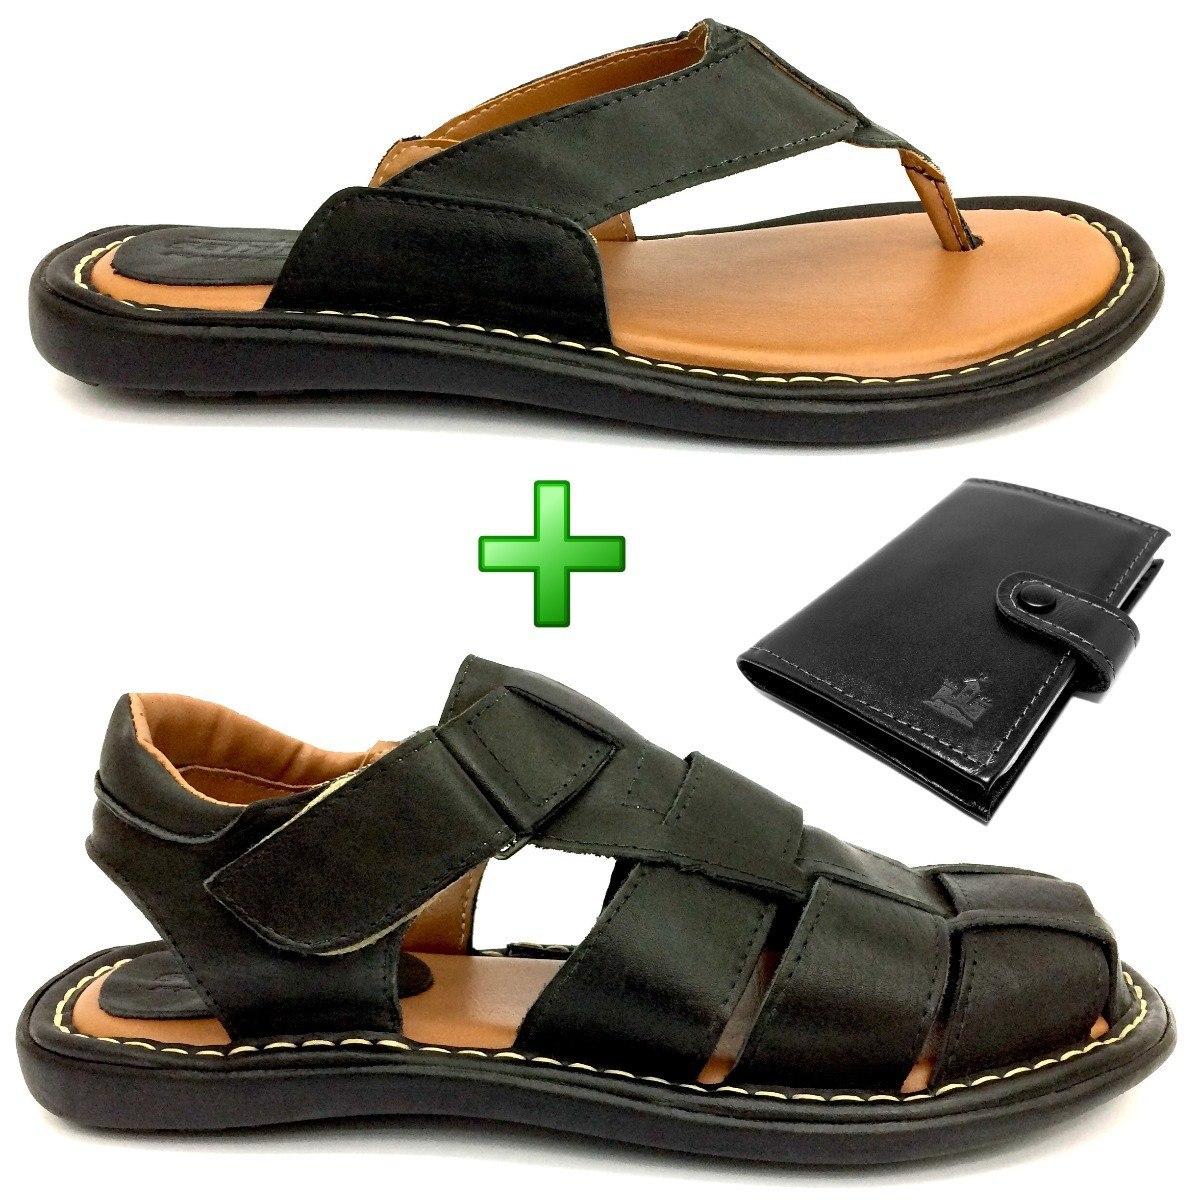 78846751aa sandália + chinelo + carteira couro preto masculino kit a+. Carregando zoom.